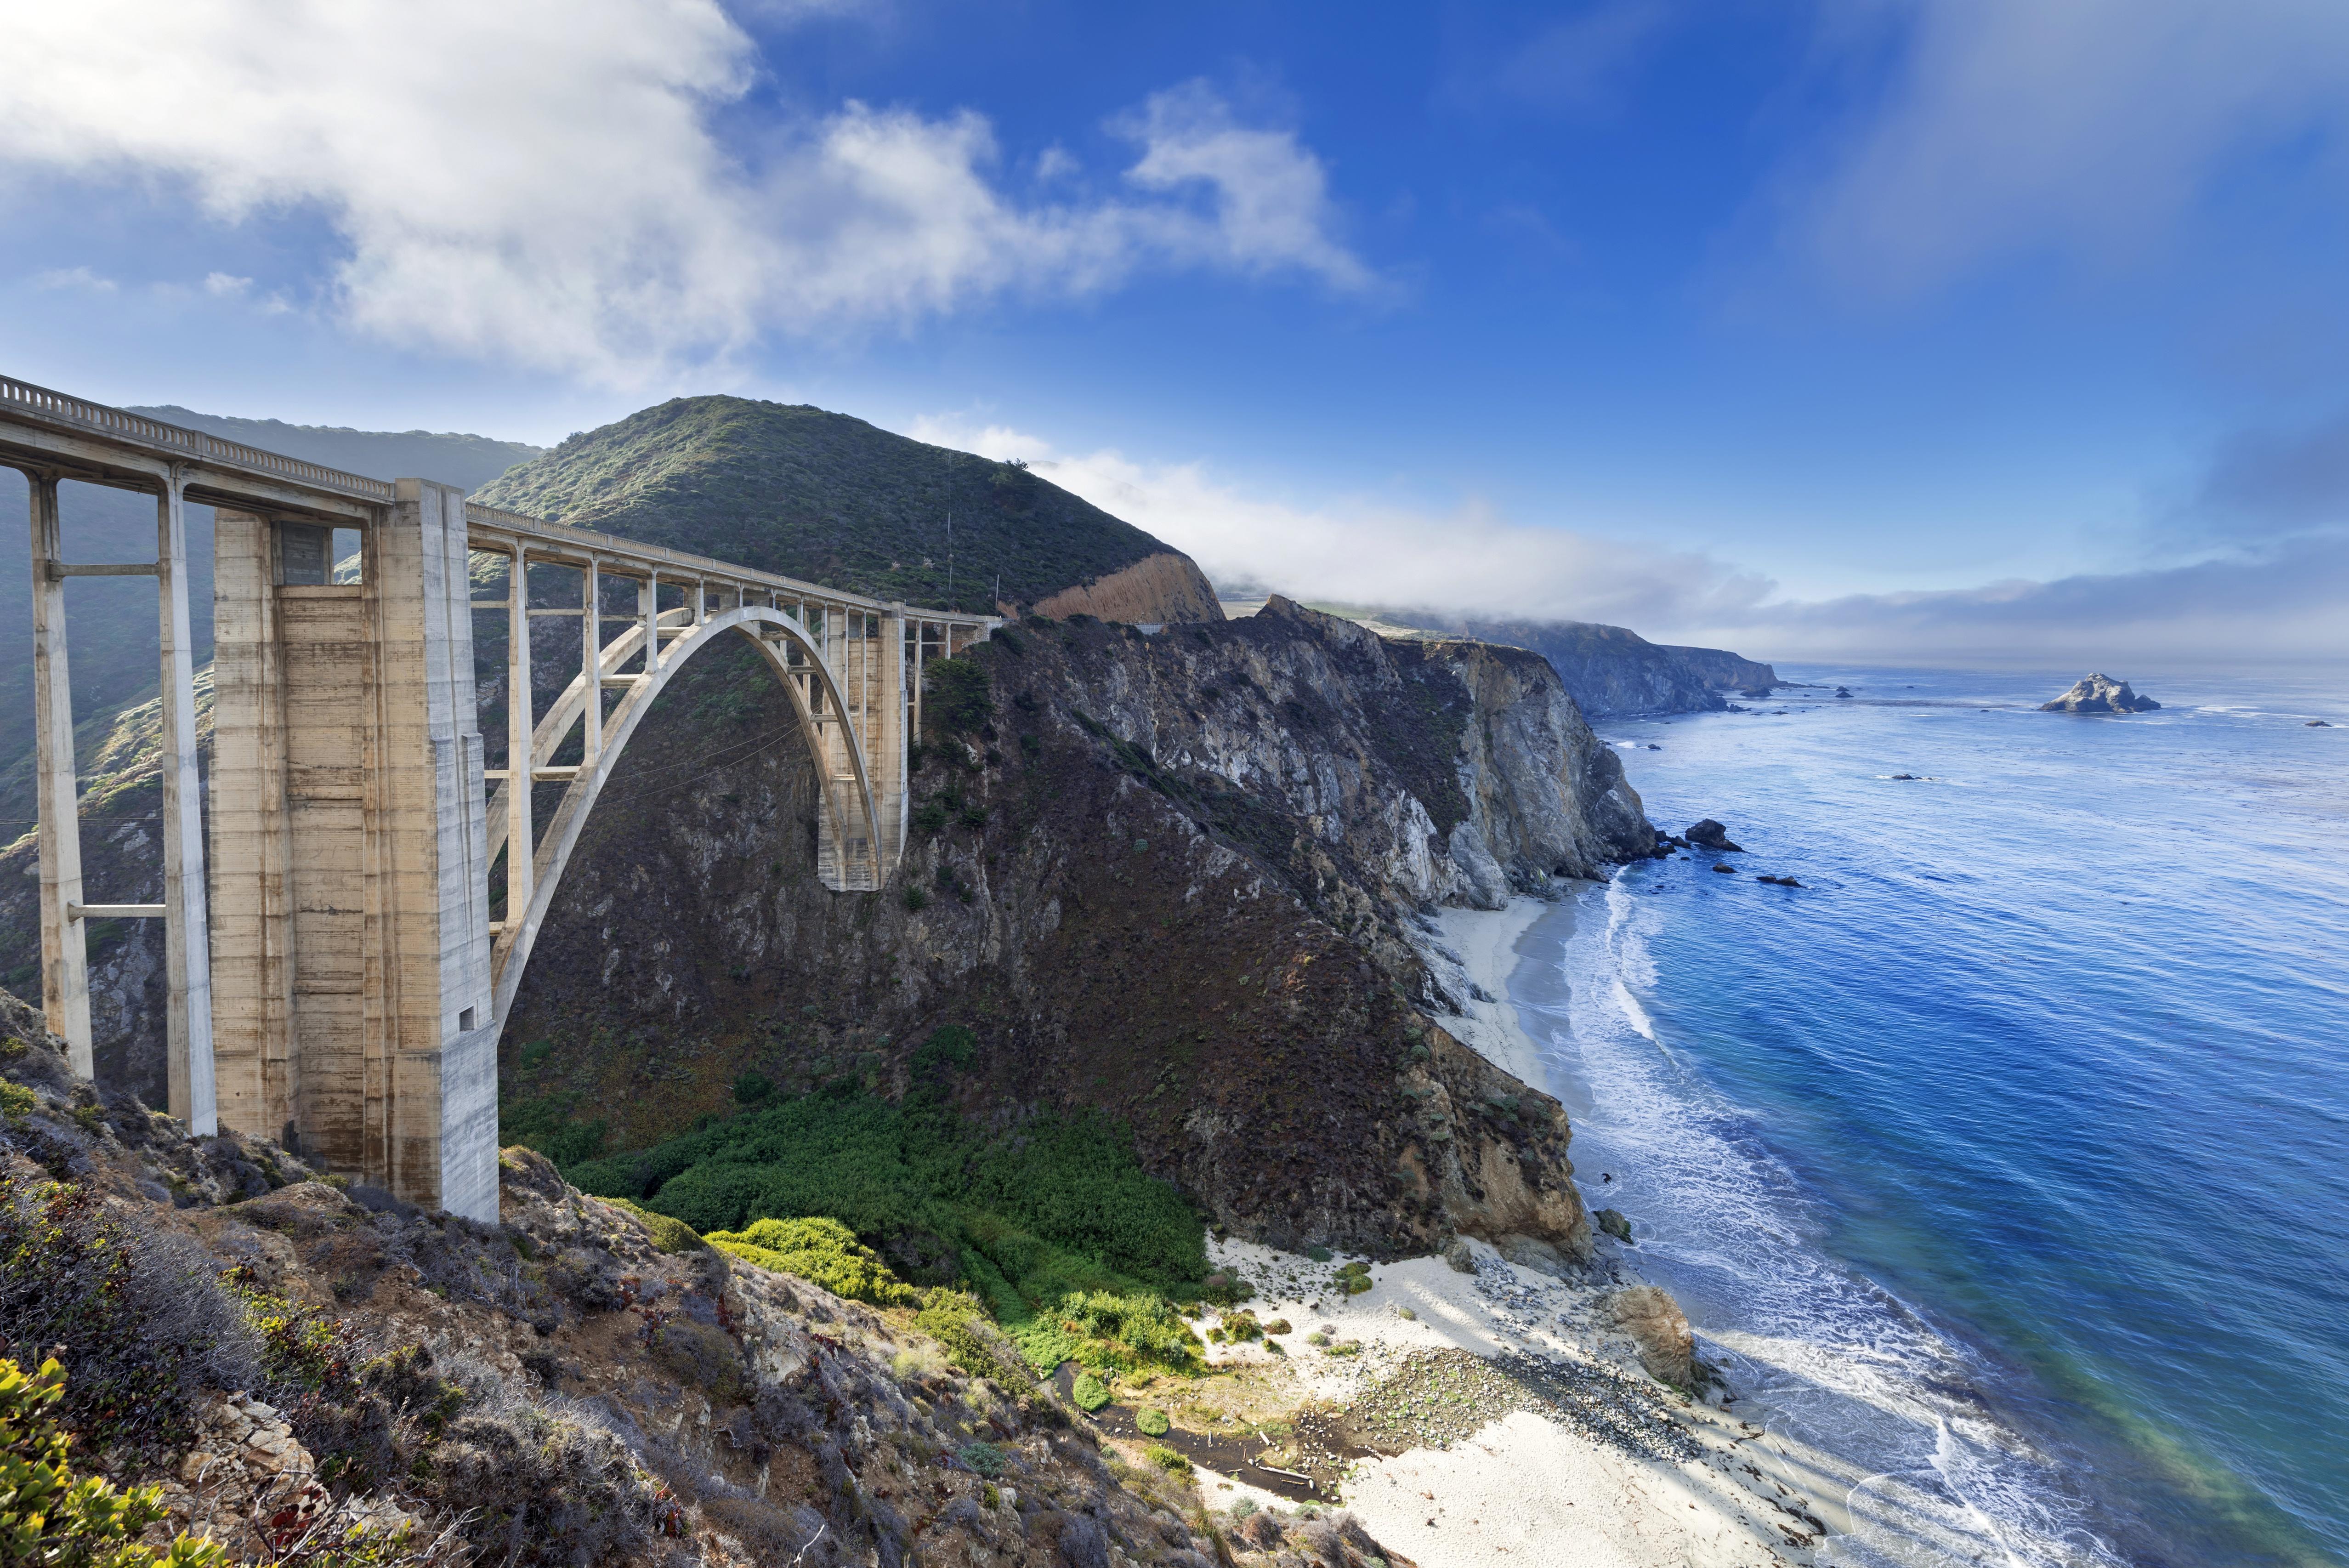 You've-Got-MAIDS-MAID-MOBILE-Crossing-California-Bixby-Bridge-in-Big-Sur.jpg